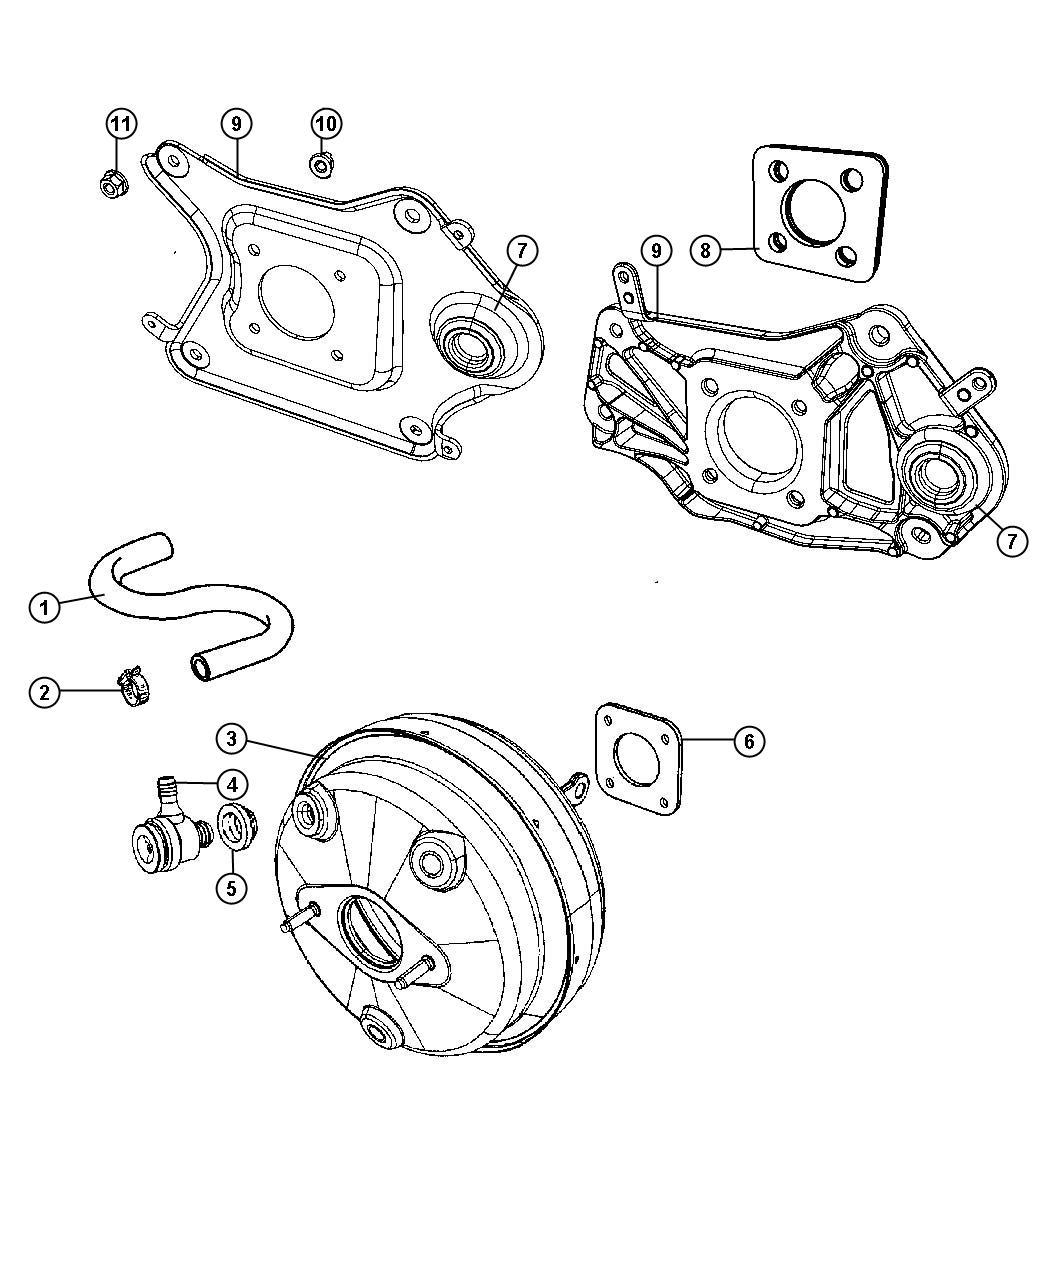 2008 Dodge NITRO Booster. Power brake. Maintenance, vacuum